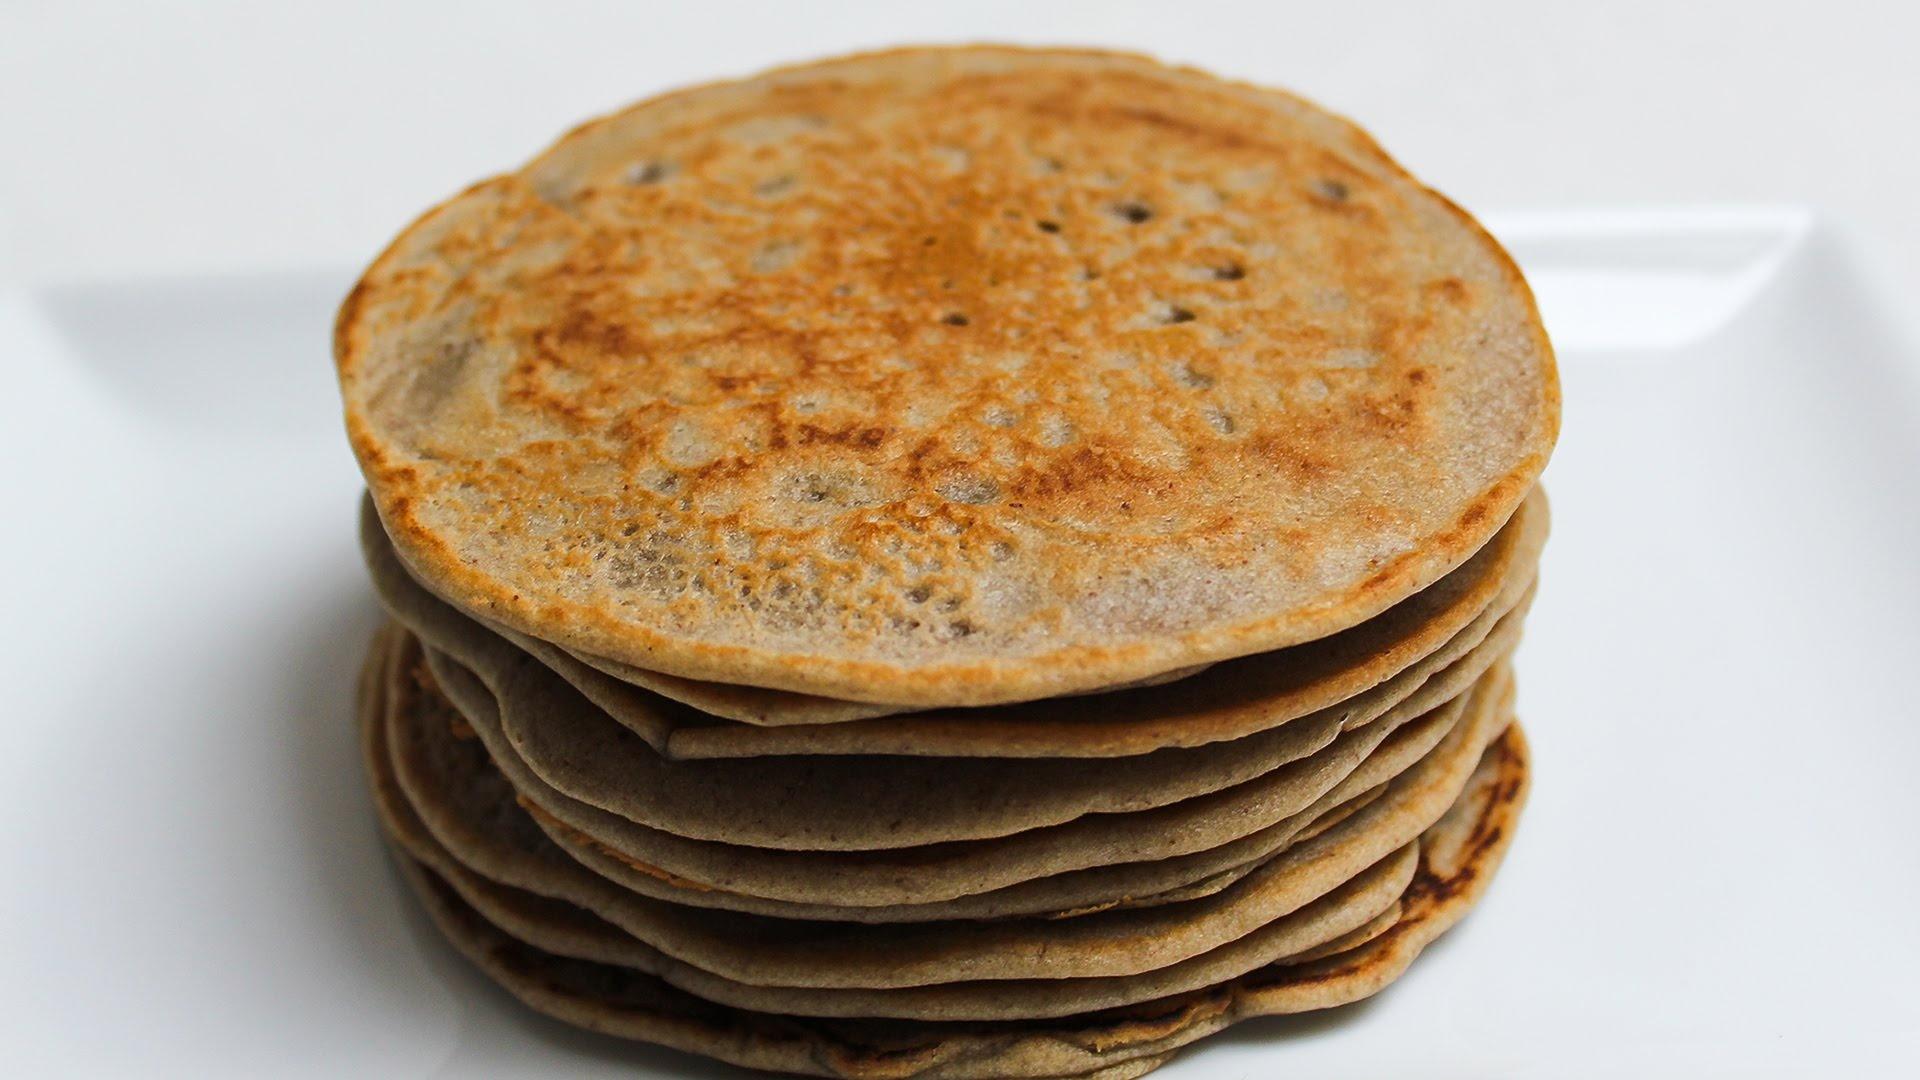 Buchweizen vegan pfannkuchen pancake vegan